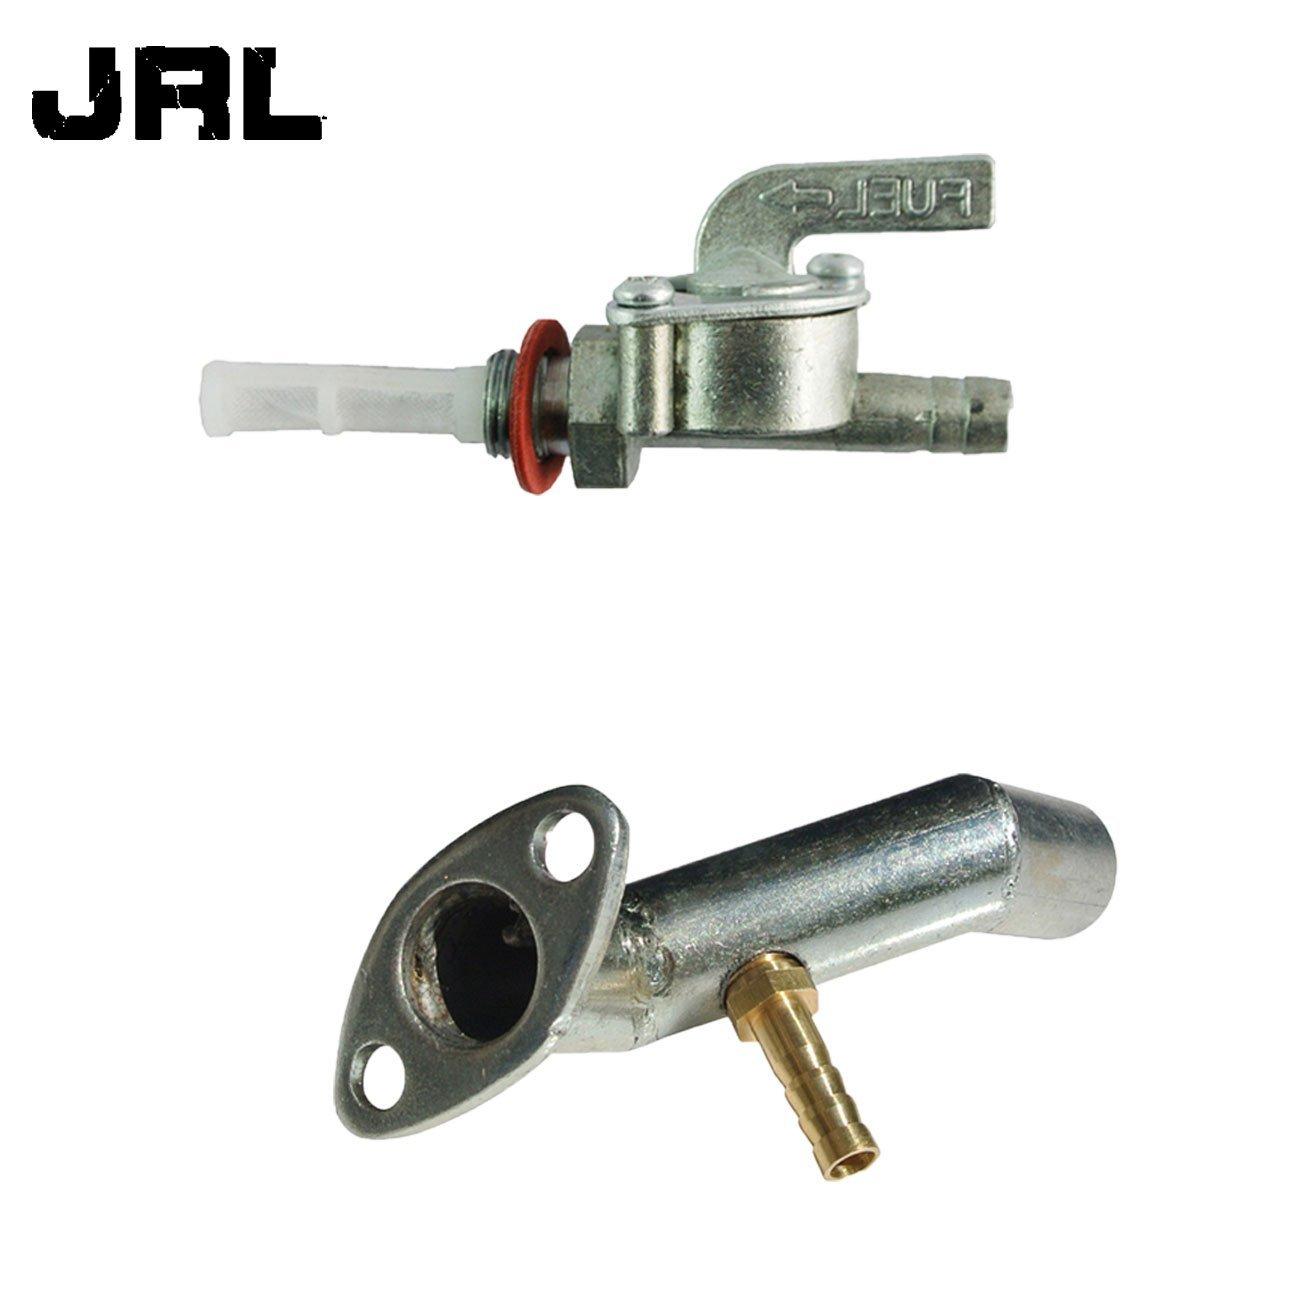 JRL Fuel Tank Switch & Intake Manifold For 49/66/80cc 2 Stroke Engine Motorized Bike